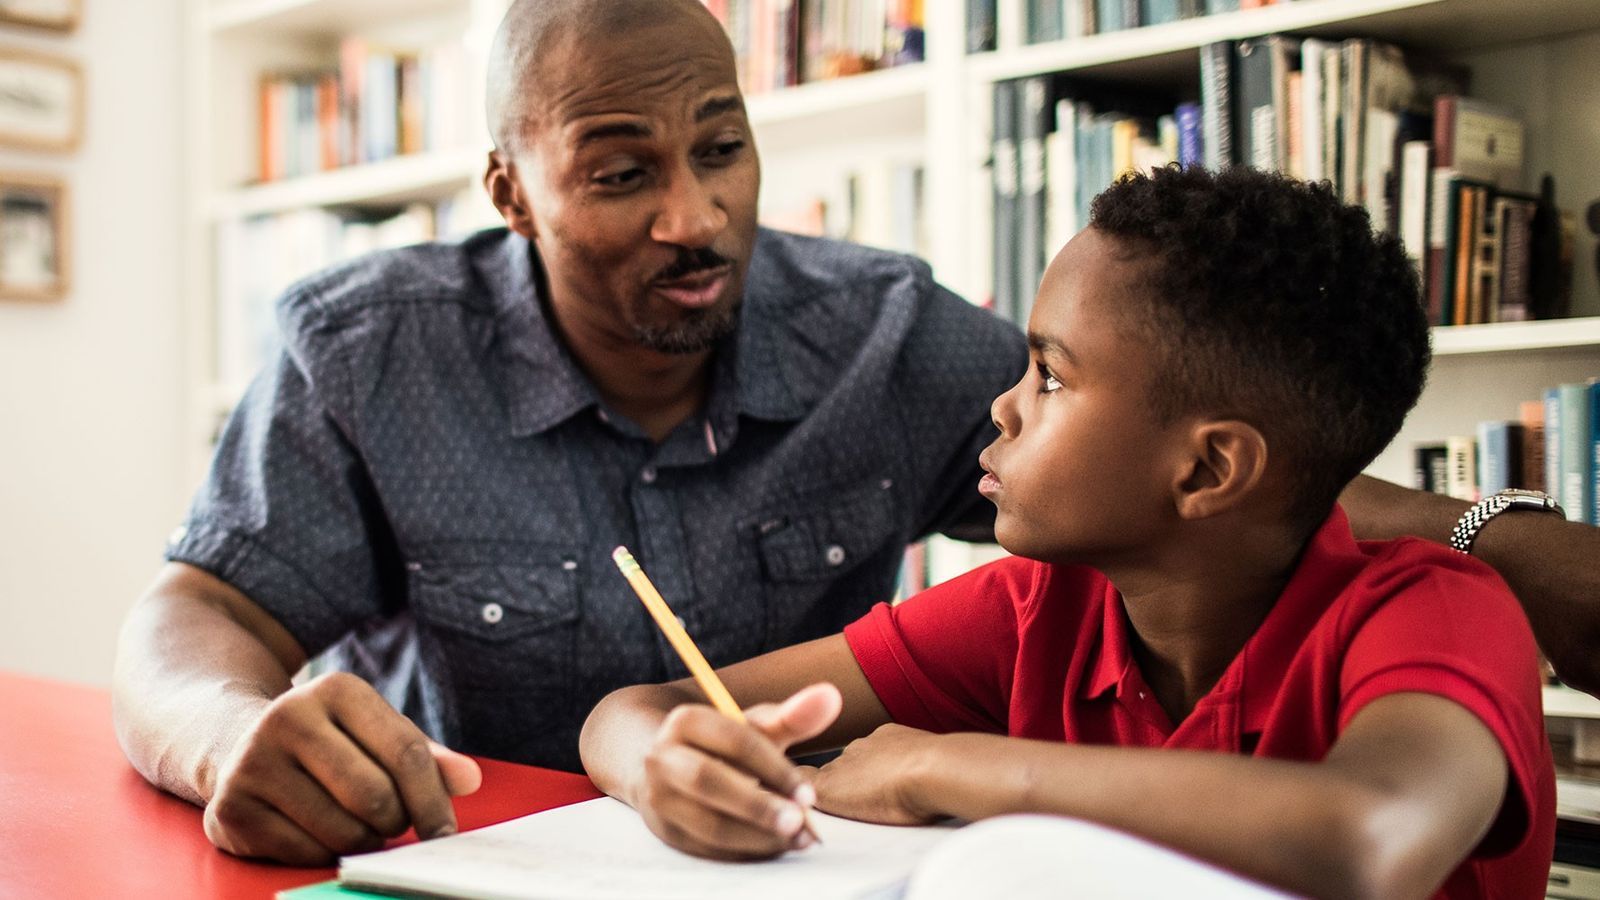 Homeschooling will soon be nationwide when the UK's school closure kicks in next week. Here's how ...